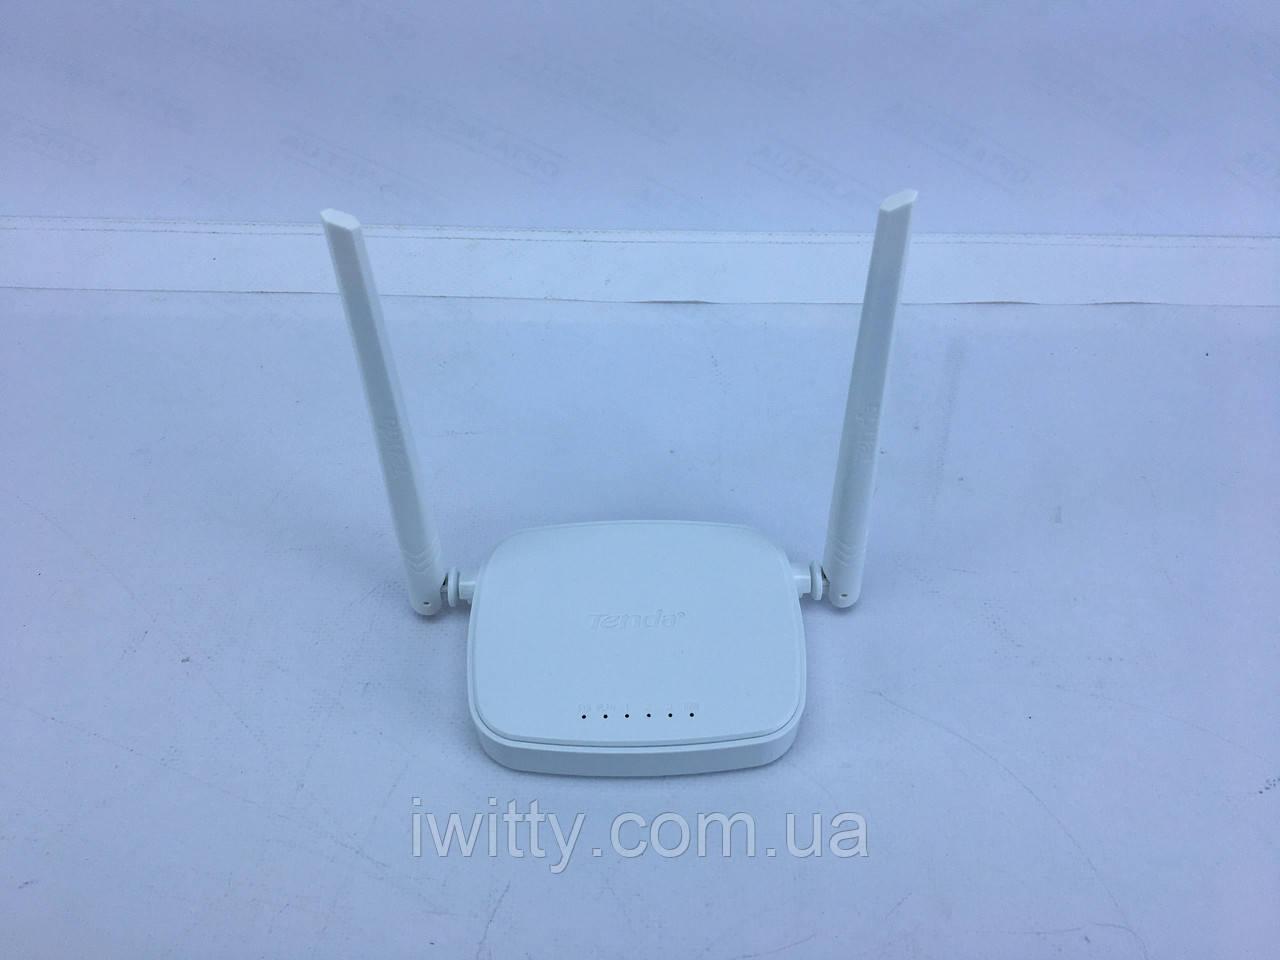 Wi-FI роутер Tenda N301 300 Wireless N Easy Setup Router